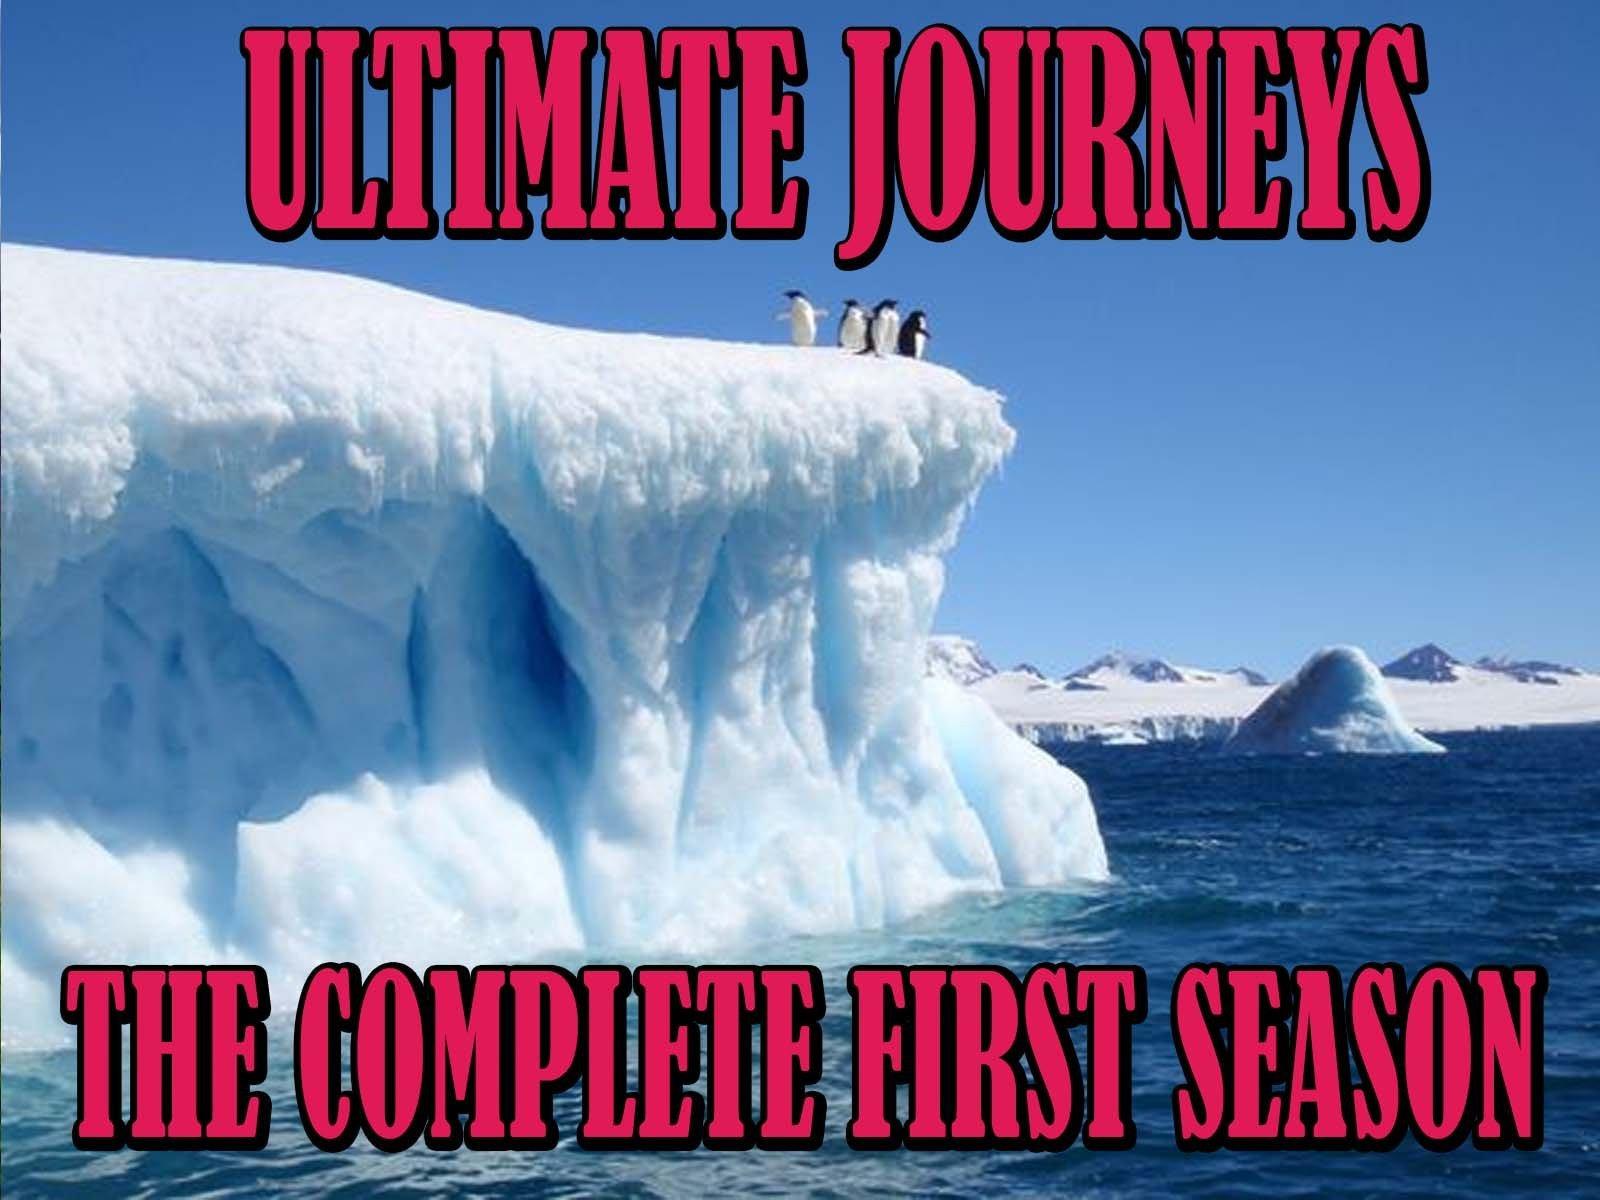 Amazon.com: Ultimate Journeys - The Complete First Season: John Hedges, John Stoneman: Amazon Digital Services LLC